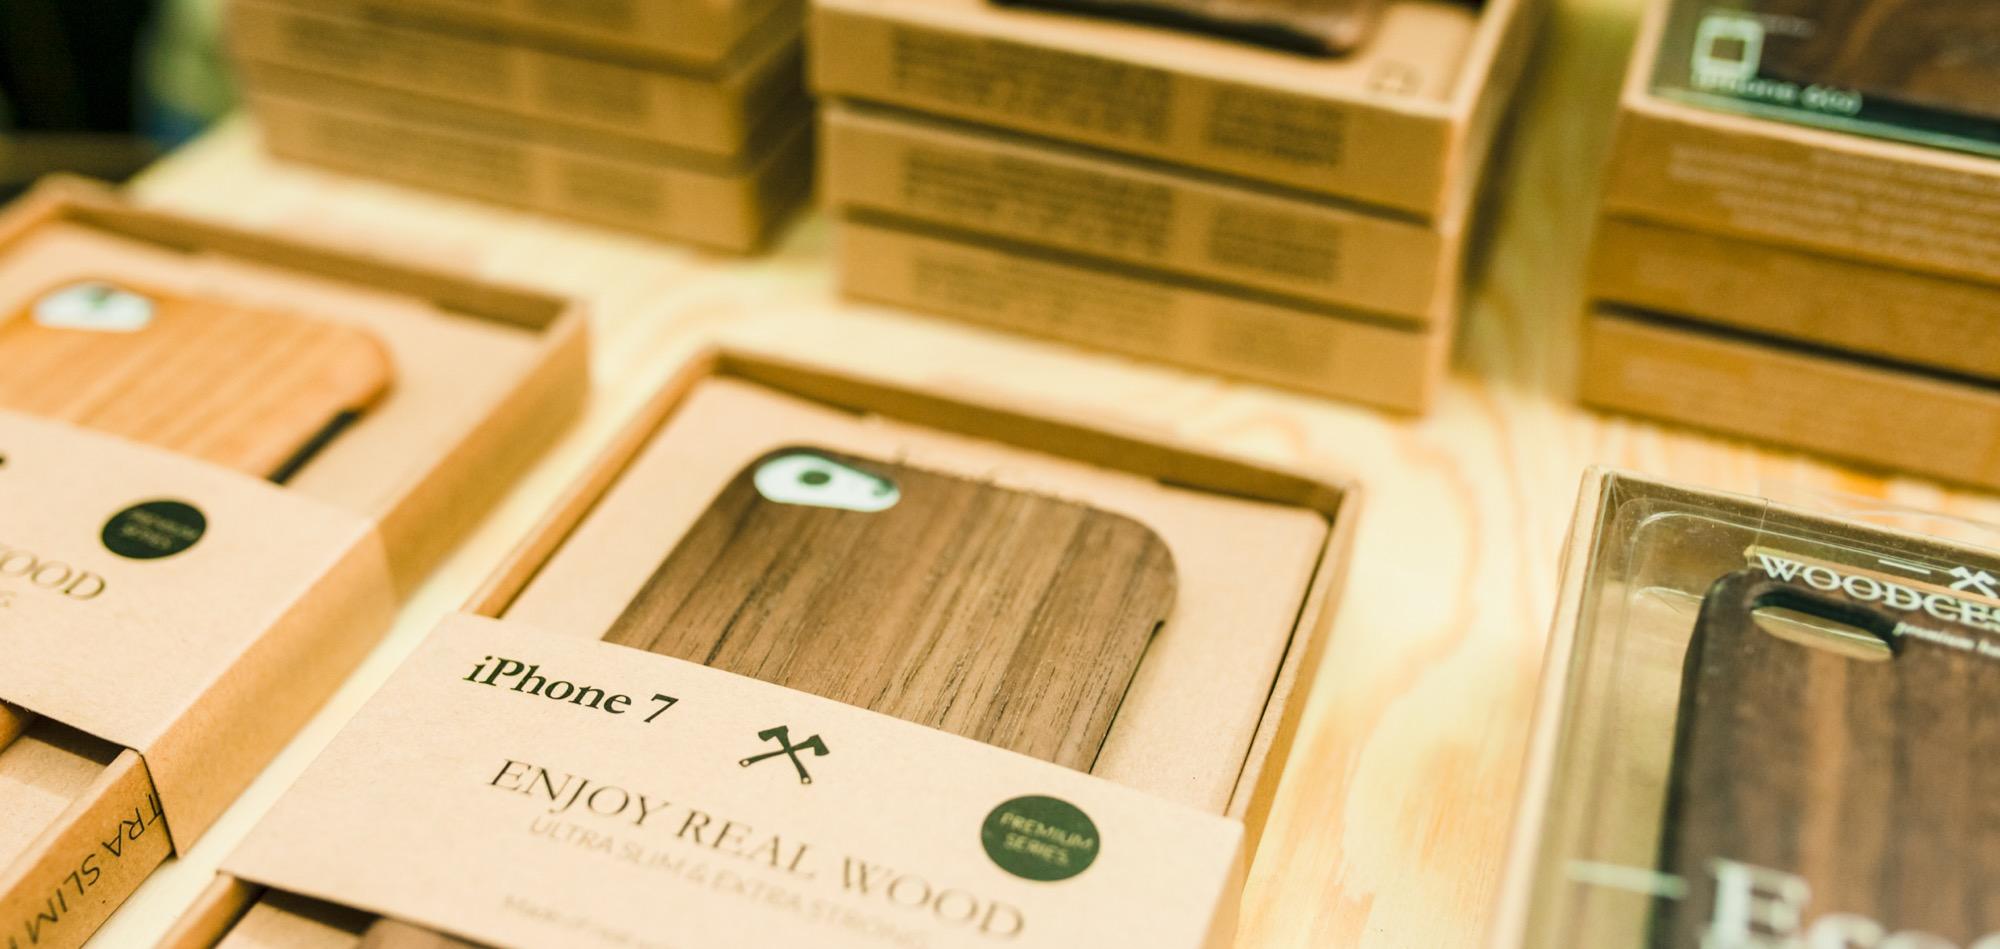 woodcessories-wood-wooden-apple-lift-laptop-iphone-huelle-schutz-skin-coverfolie4